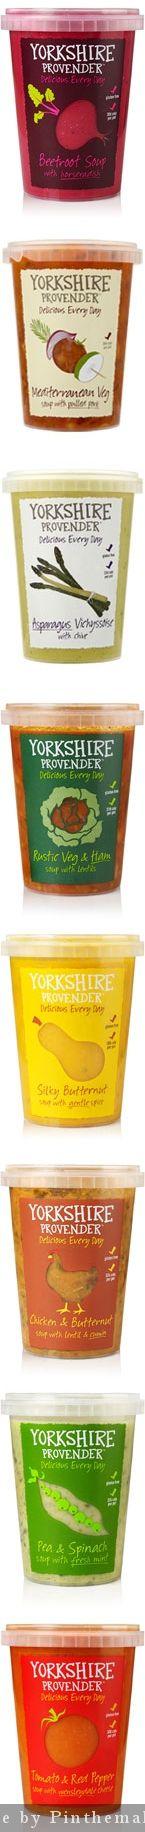 Yorkshire Provender soups